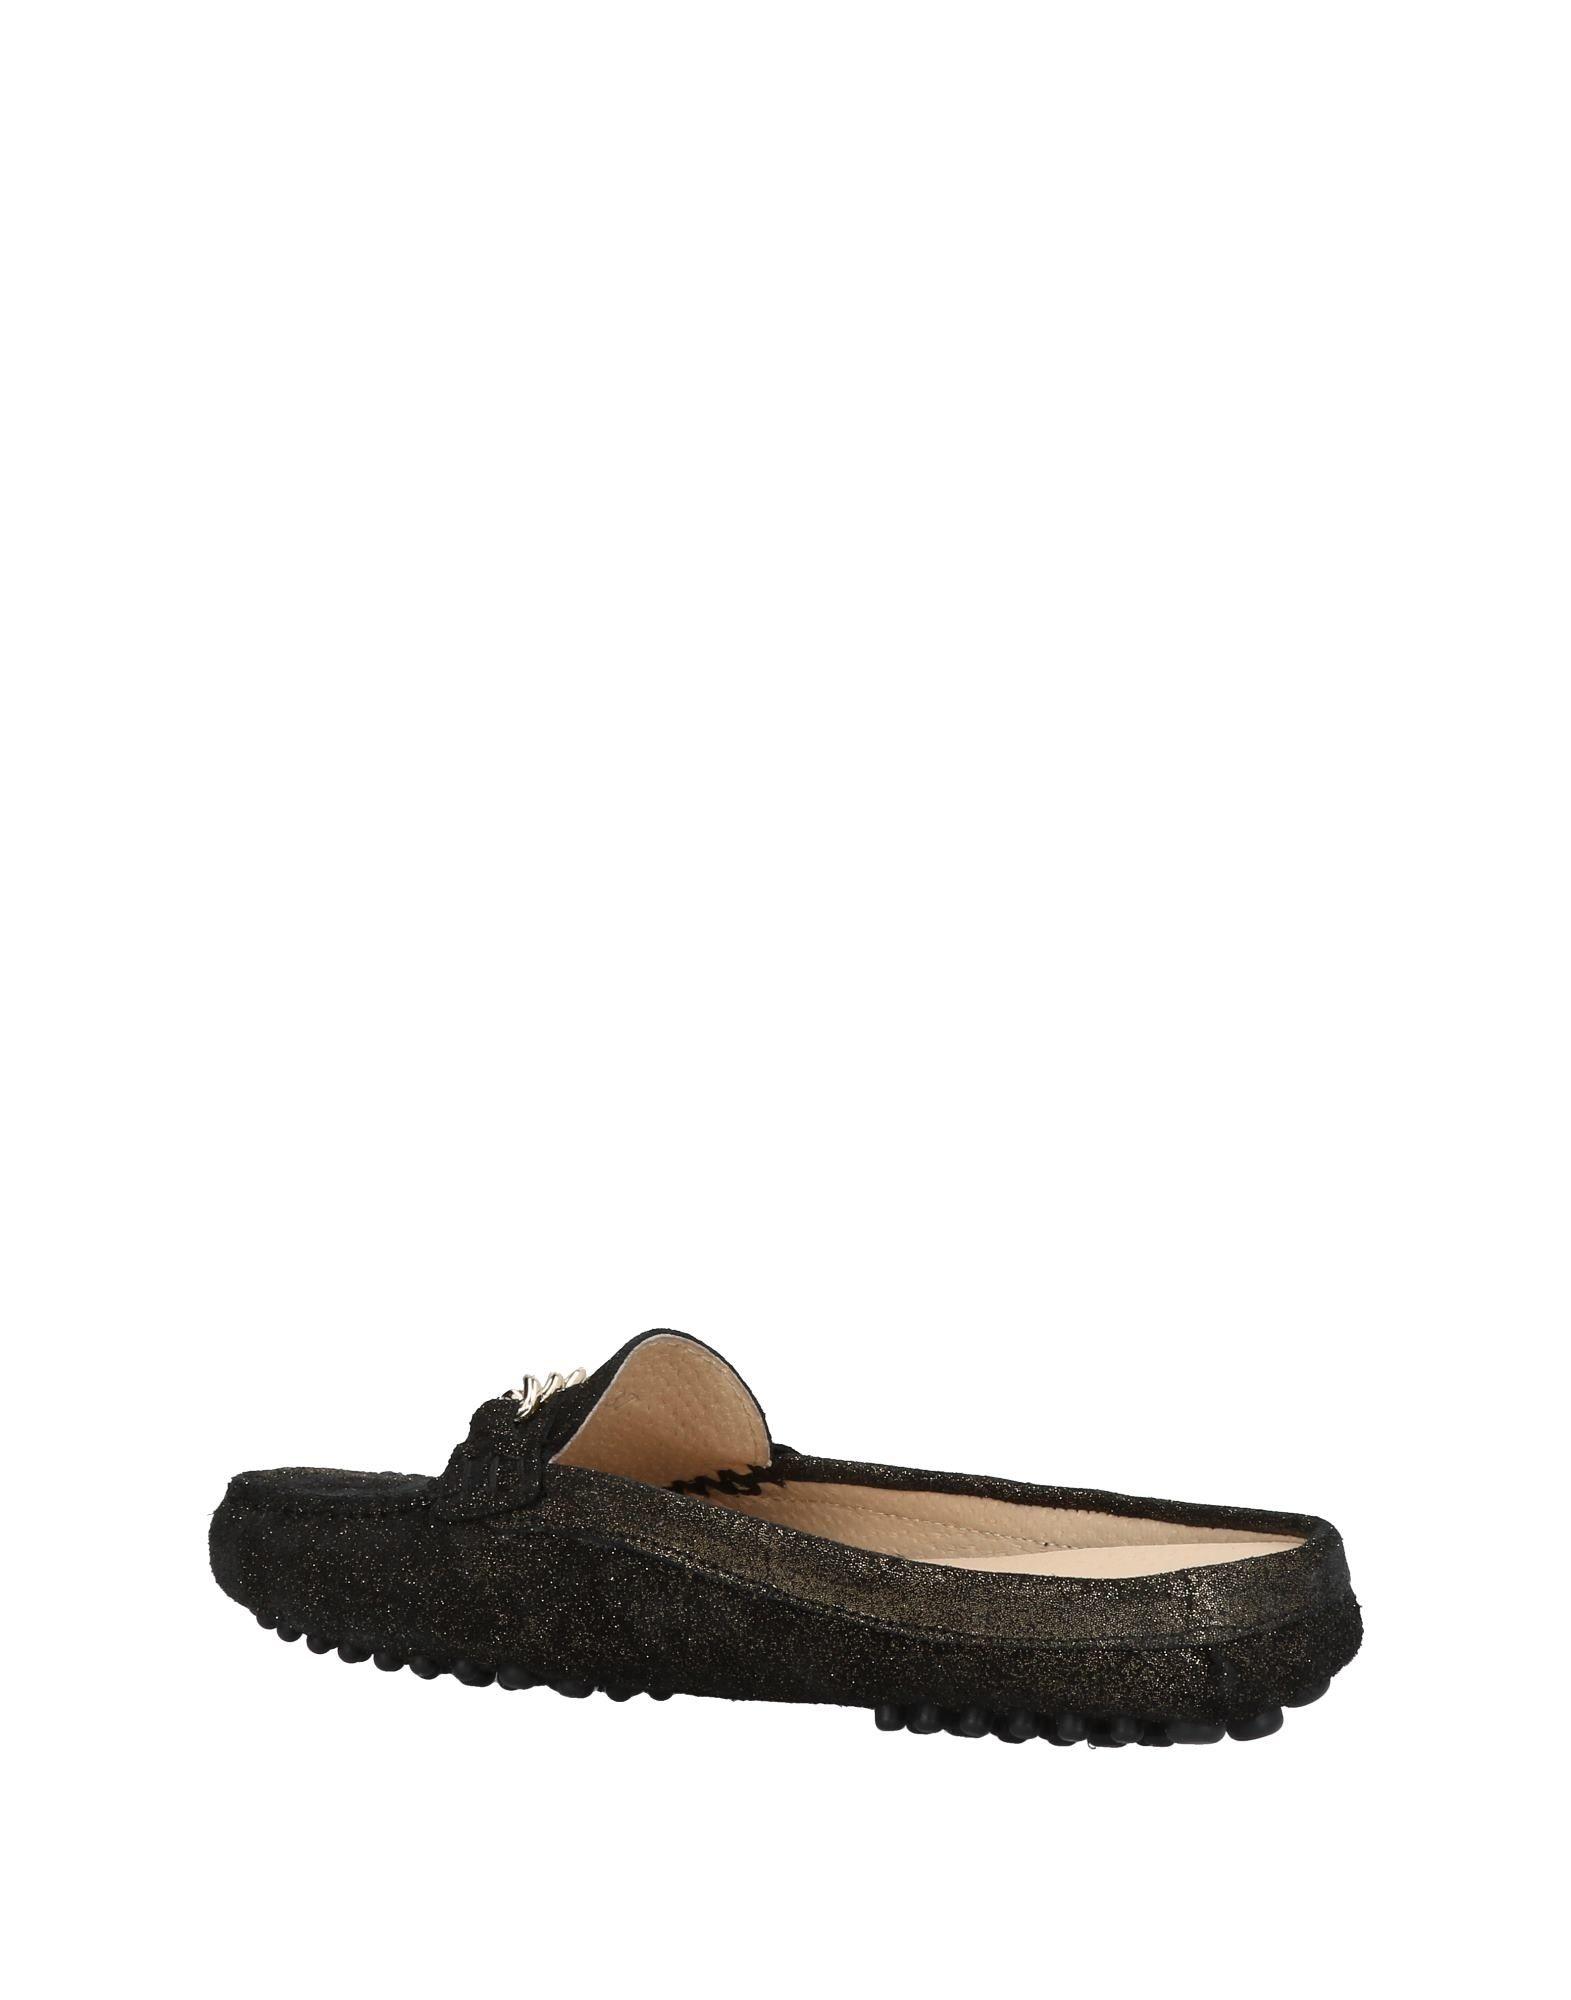 Manuela Dardozzi Pantoletten  Damen  Pantoletten 11442921EN Gute Qualität beliebte Schuhe b79013